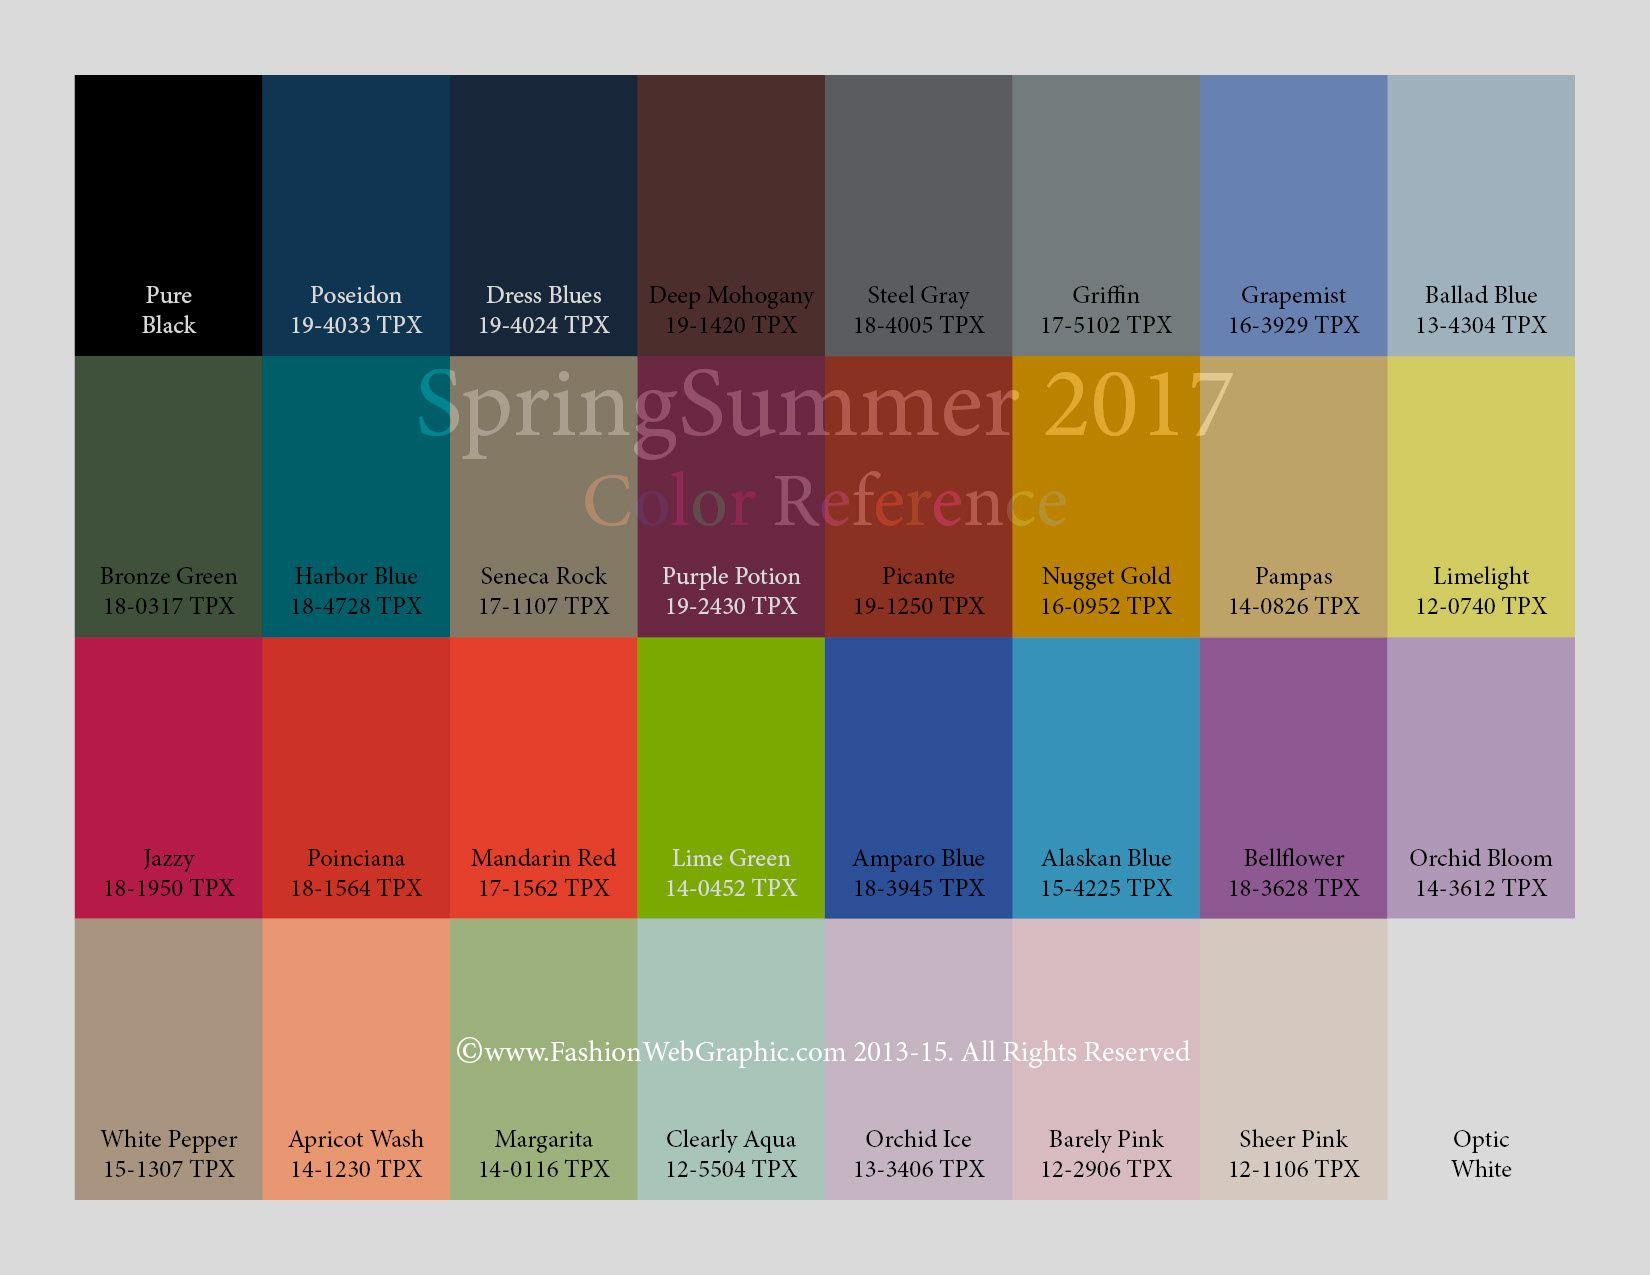 Springsummer 2017 Trend Forecasting Is A Trend Color Guide